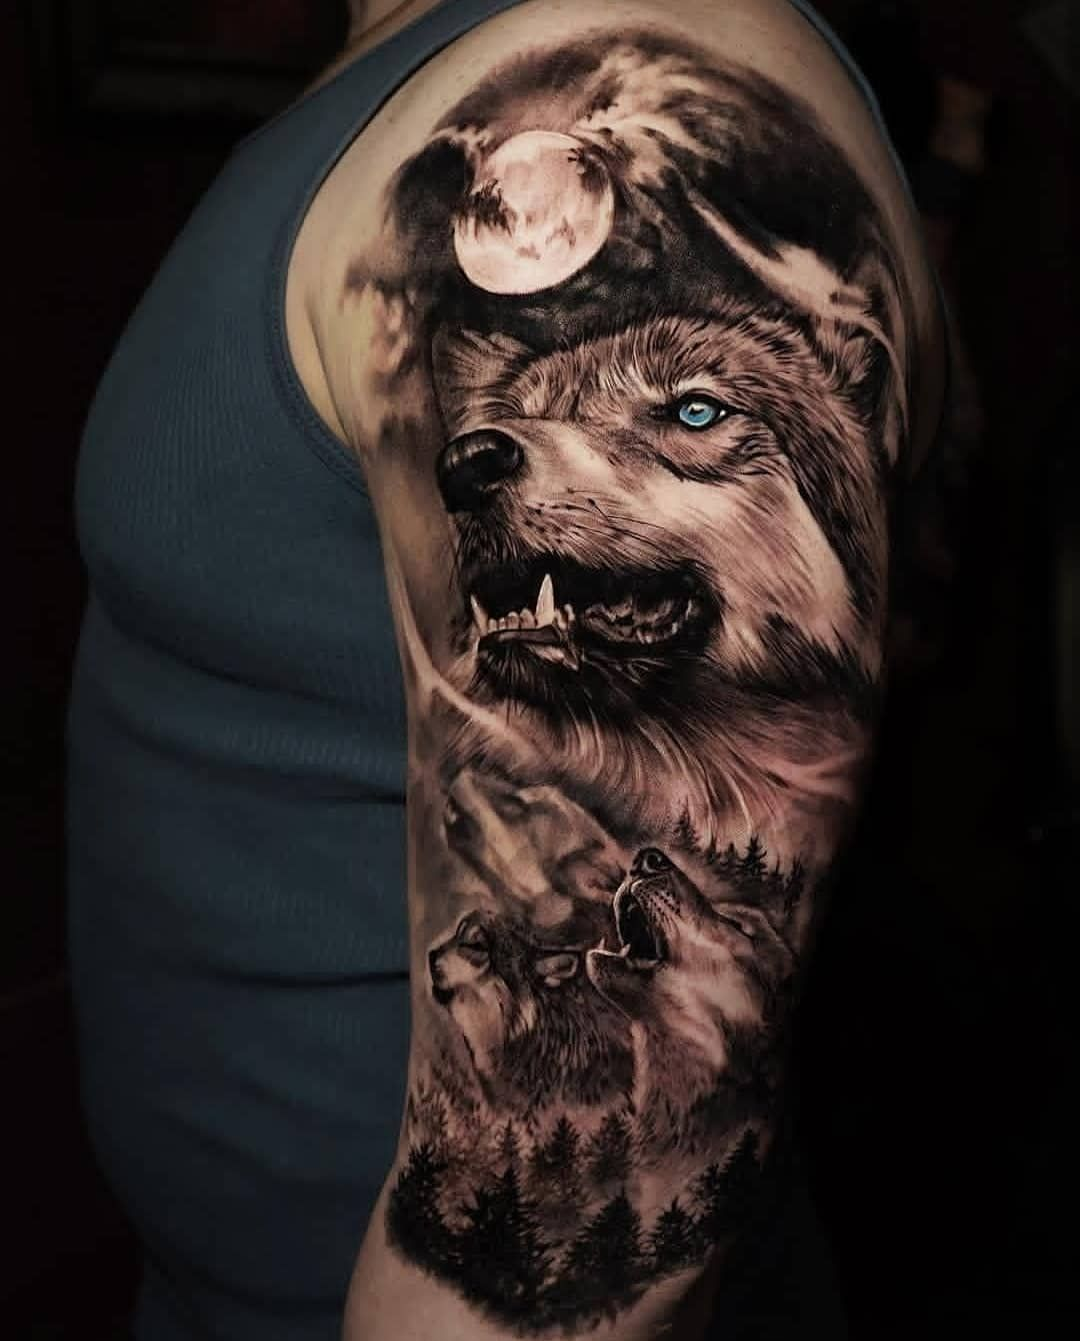 Brutal Made B Tatuajes De Lobos Diseno Del Tatuaje De Lobo Tatuaje De Tigre